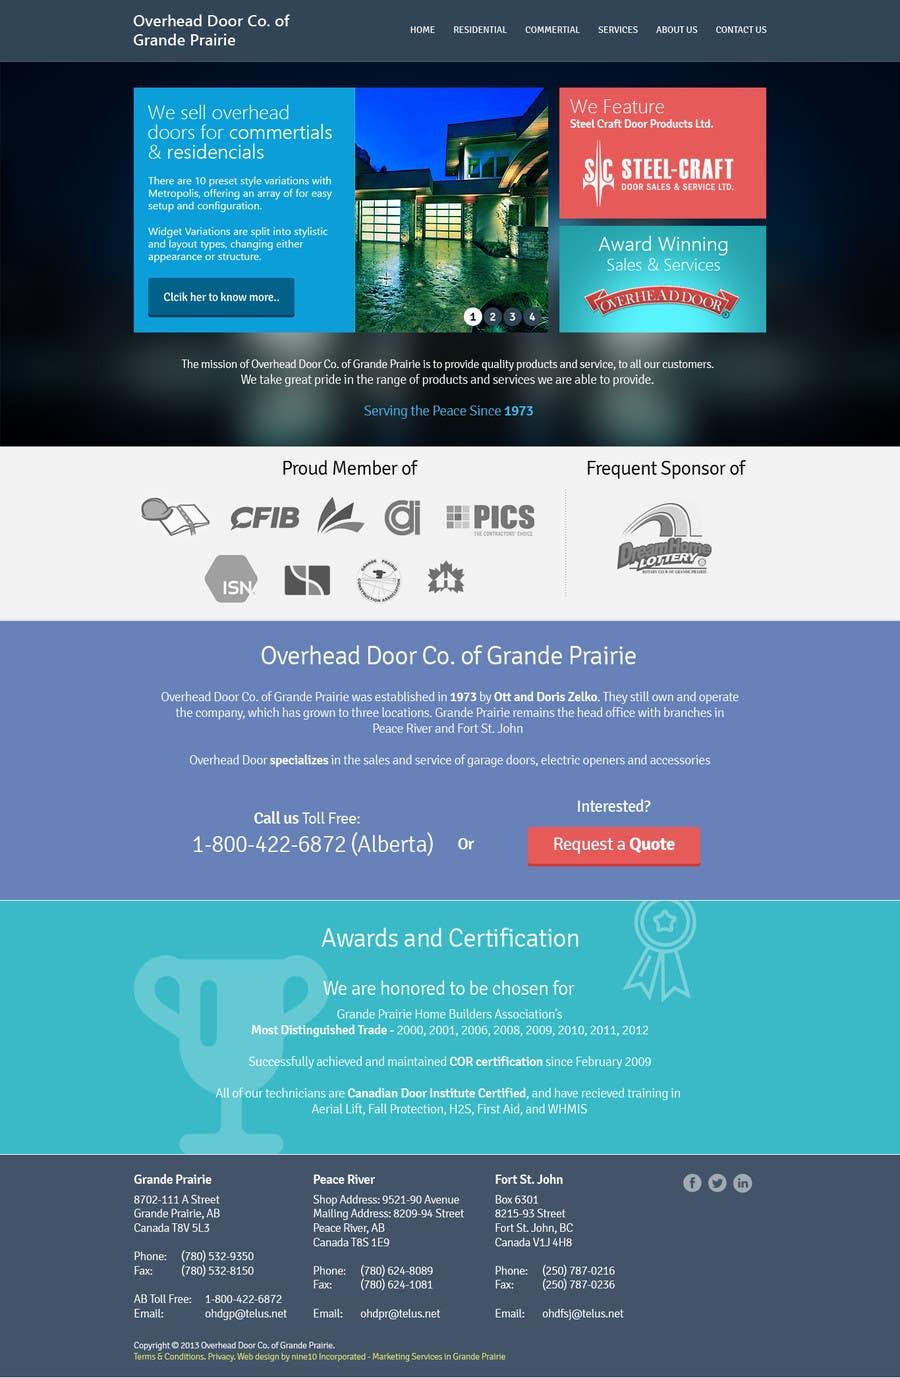 #22 for Design a Website Mockup for www.overheaddoorgp.com by informationaccur